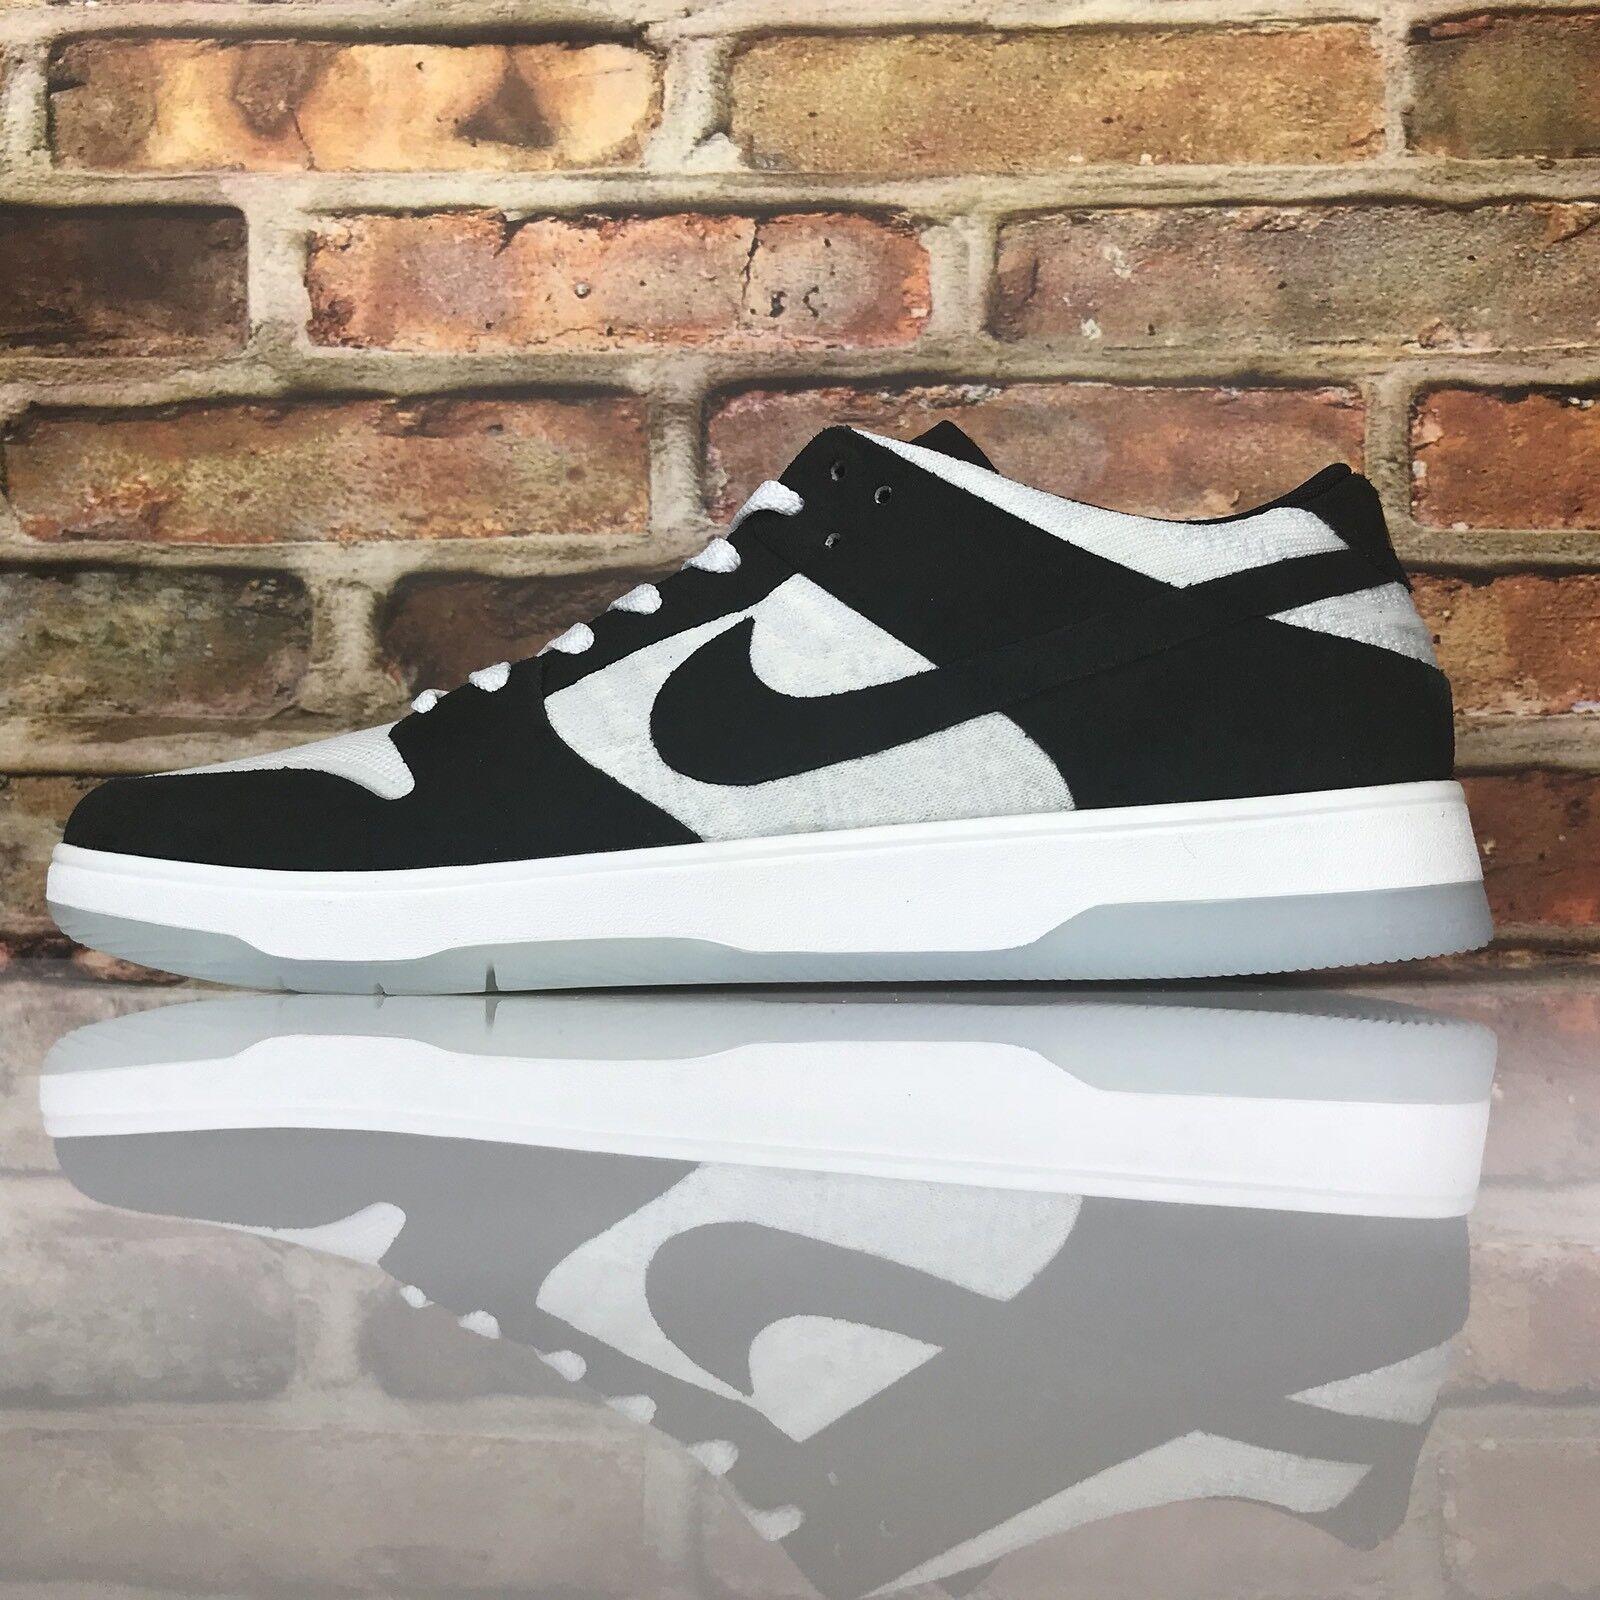 Nike SB Zoom Dunk Low Elite QS Mens 9.5 Oski Rozenberg White Black 877063-001 Cheap and beautiful fashion